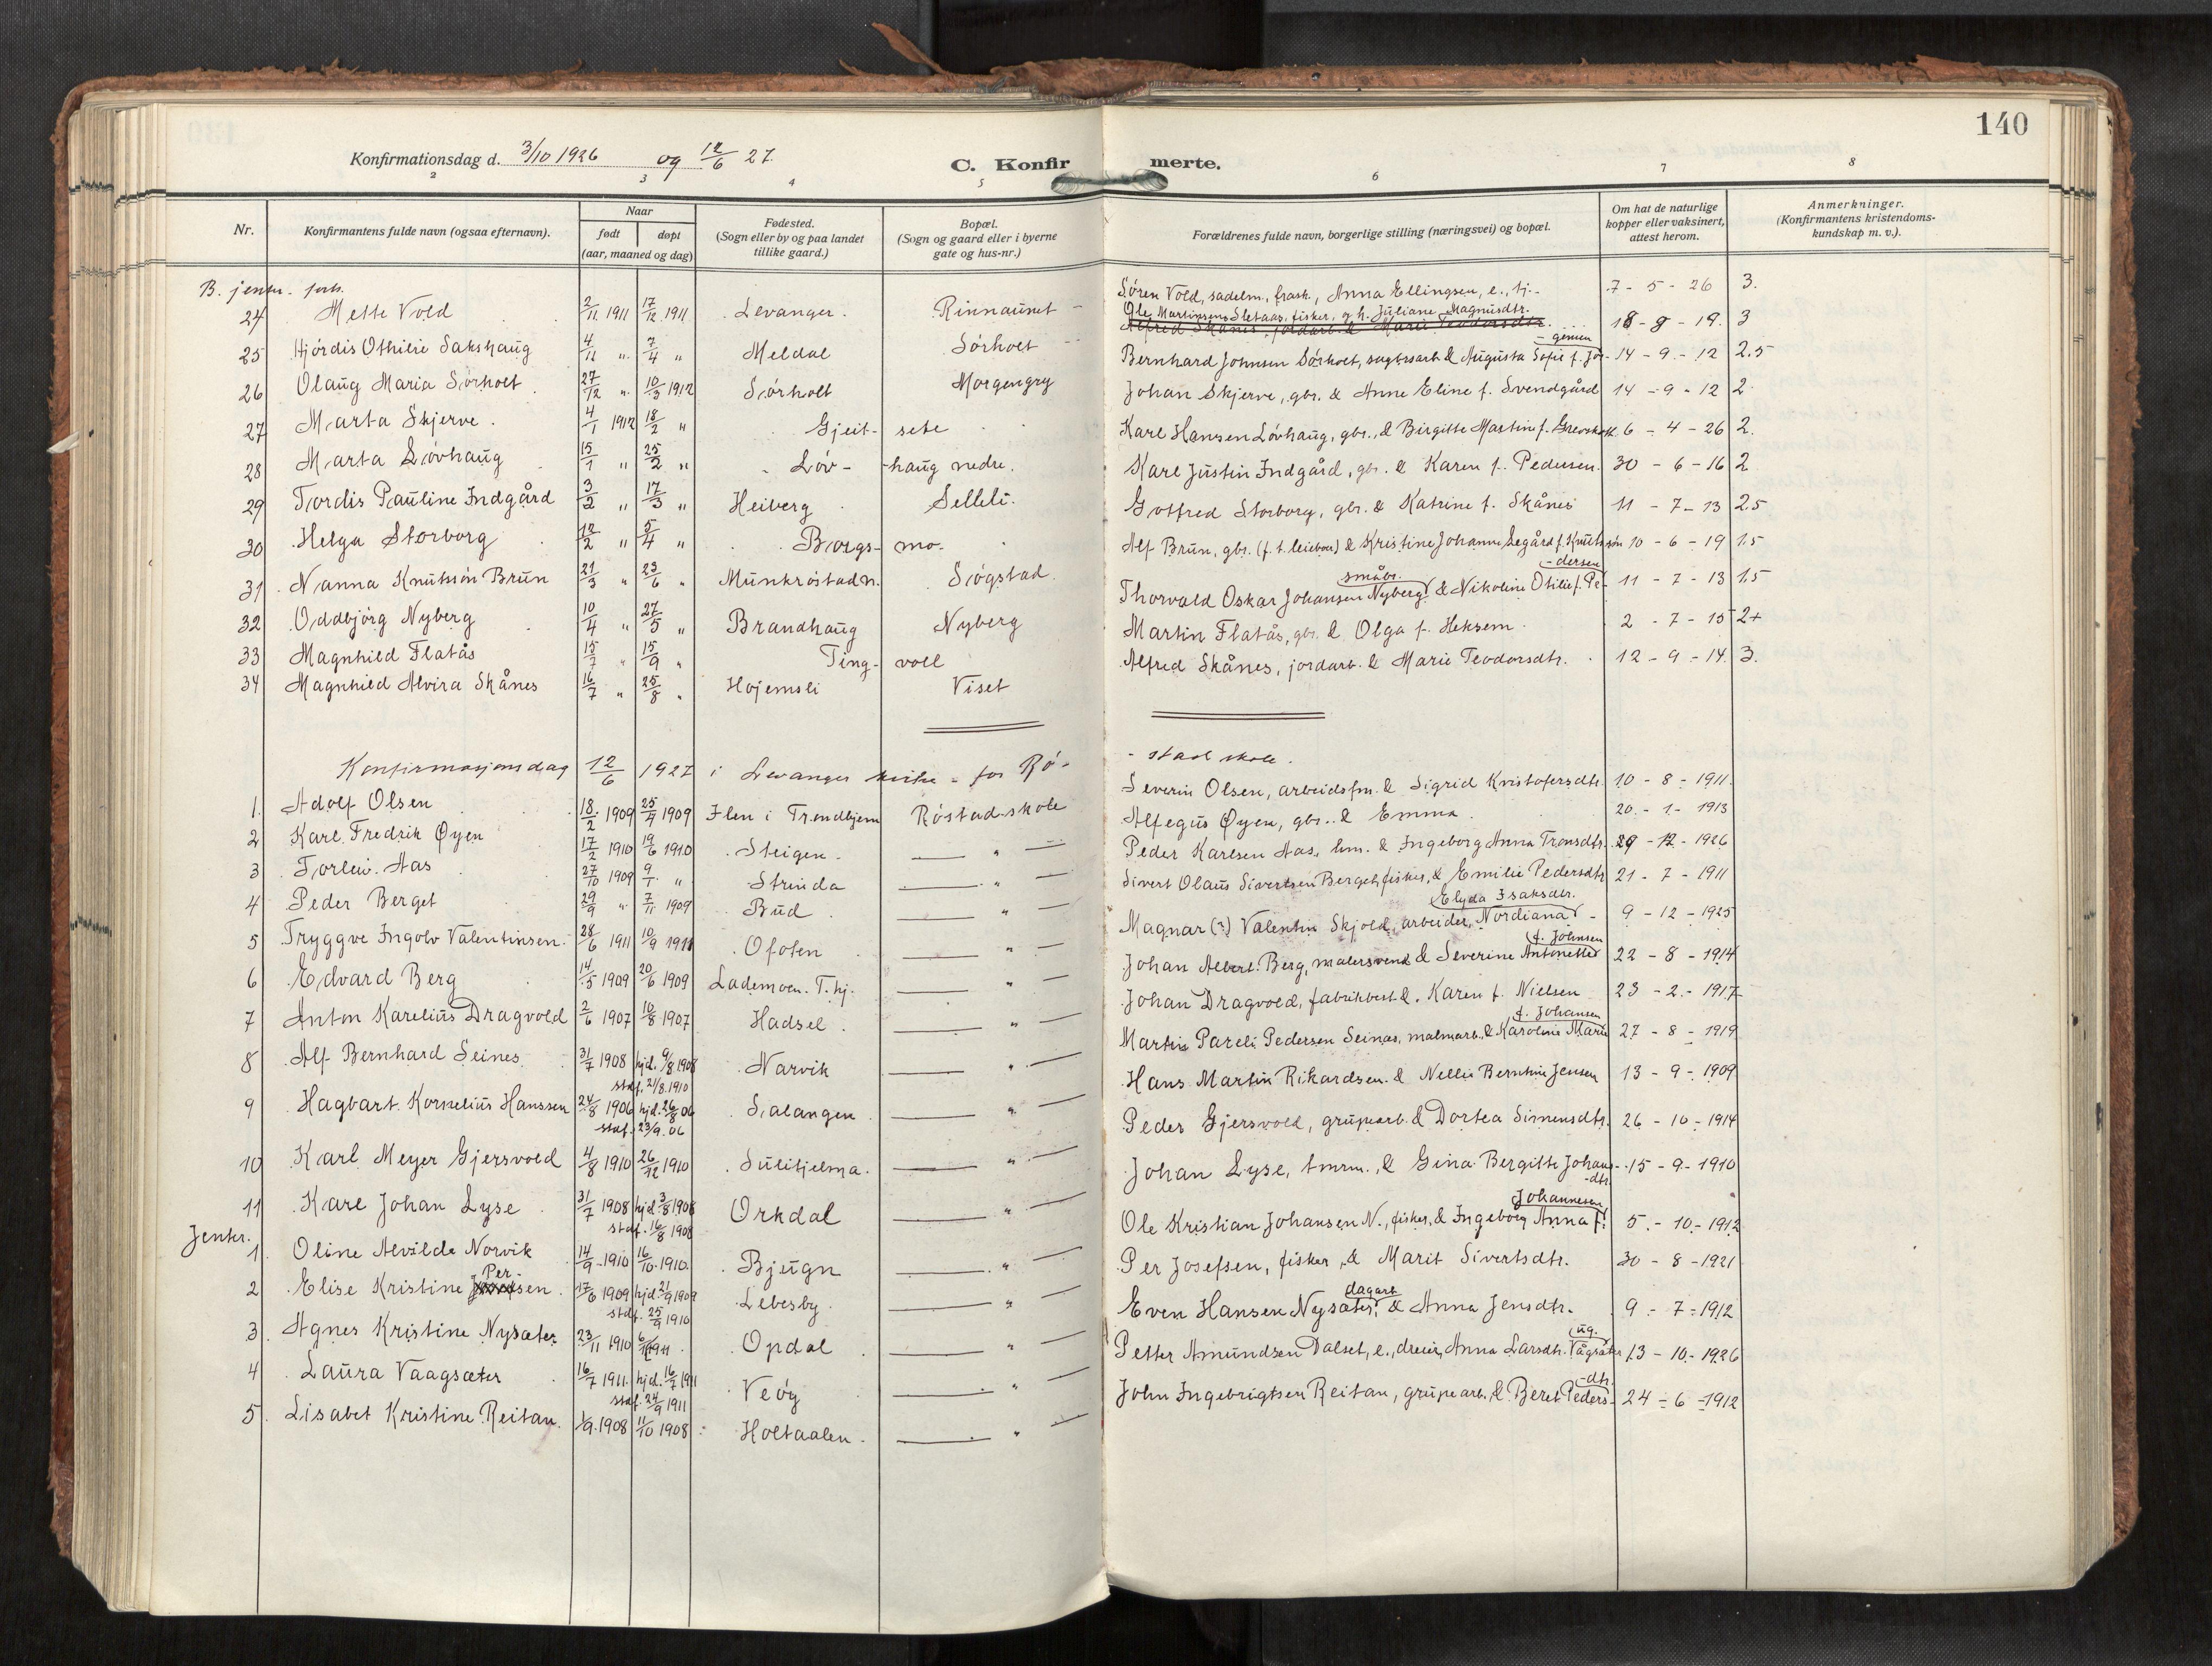 SAT, Levanger sokneprestkontor*, Parish register (official) no. 1, 1912-1935, p. 140